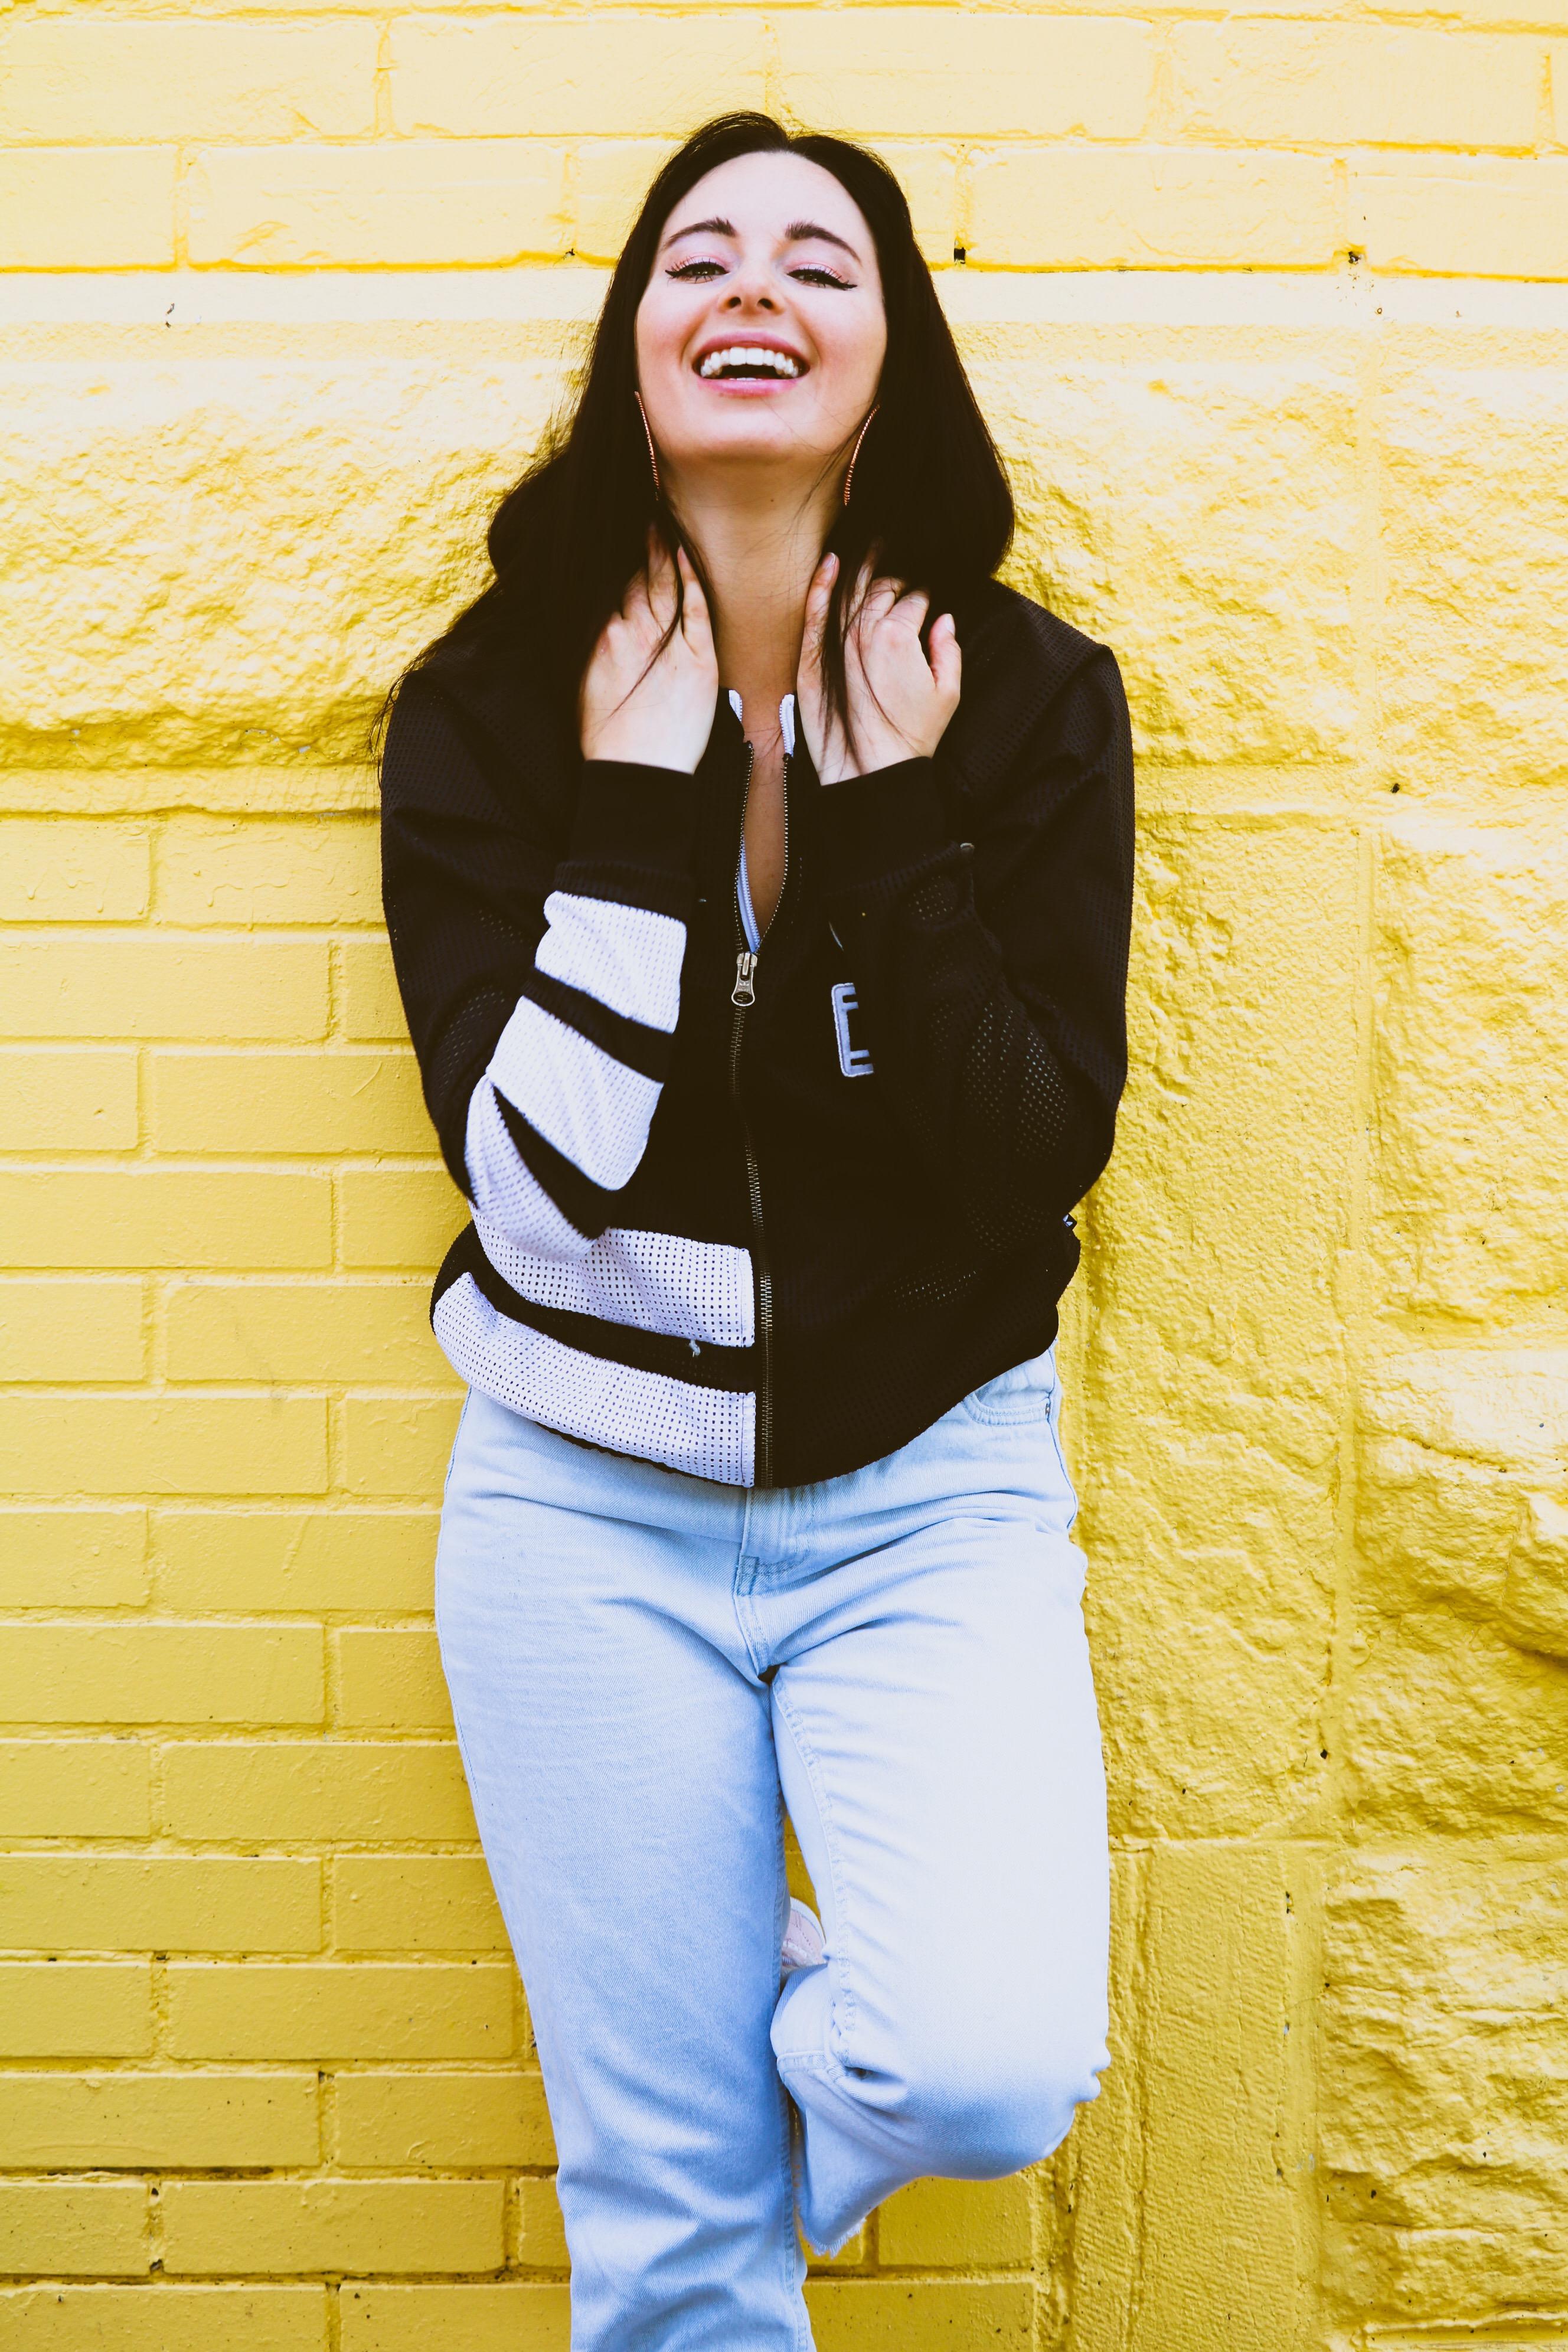 Femme qui rit devant un mur jaune